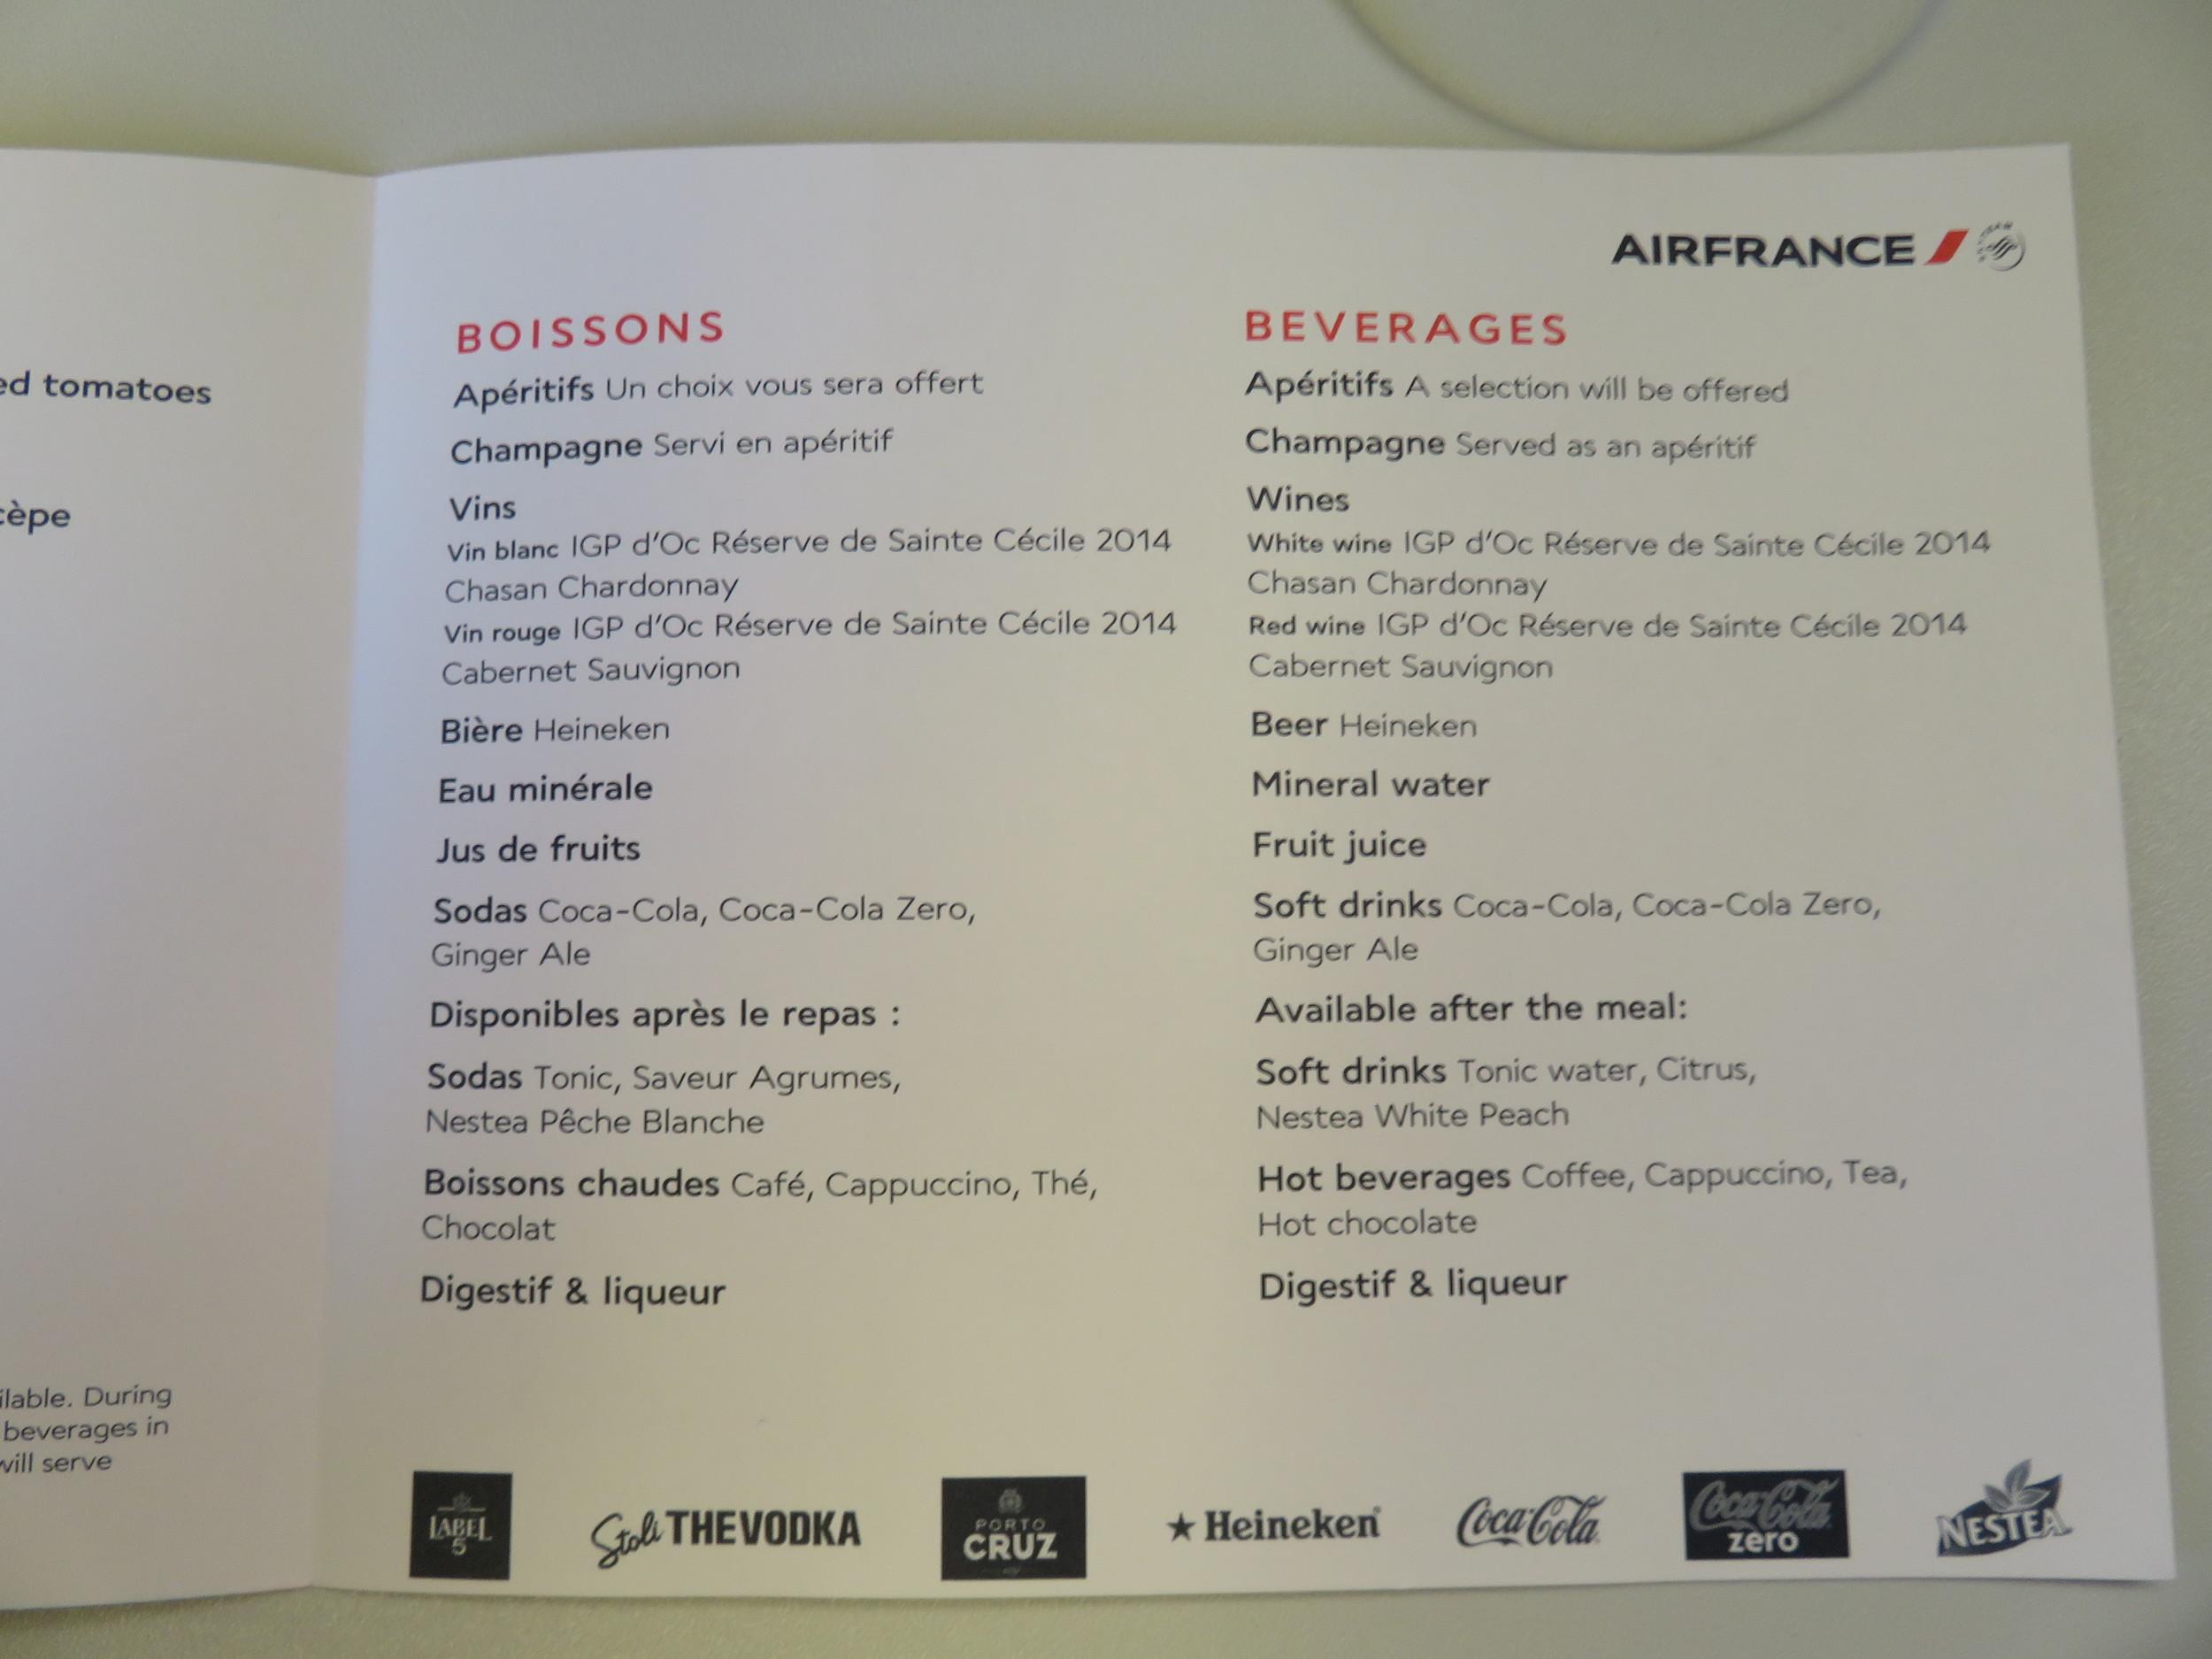 Air France economy dinner menu